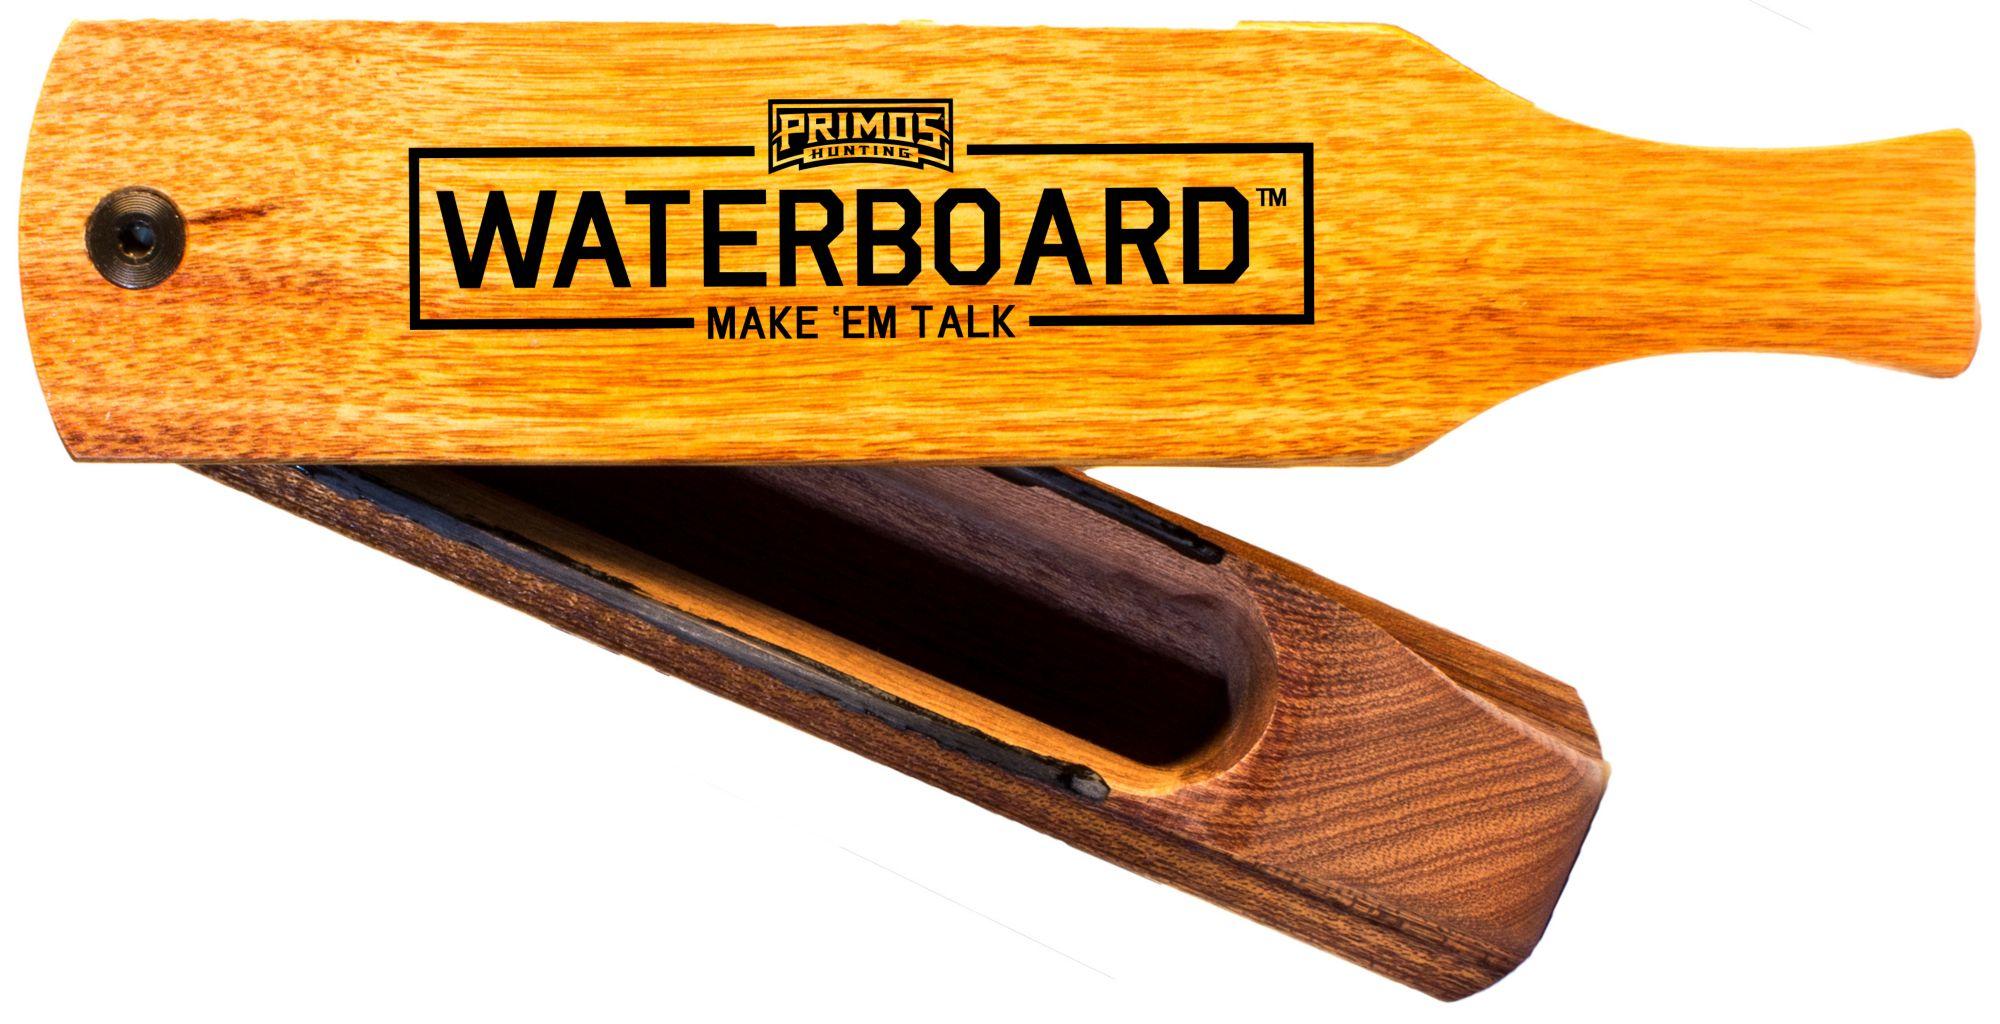 Primos Waterboard Turkey Call